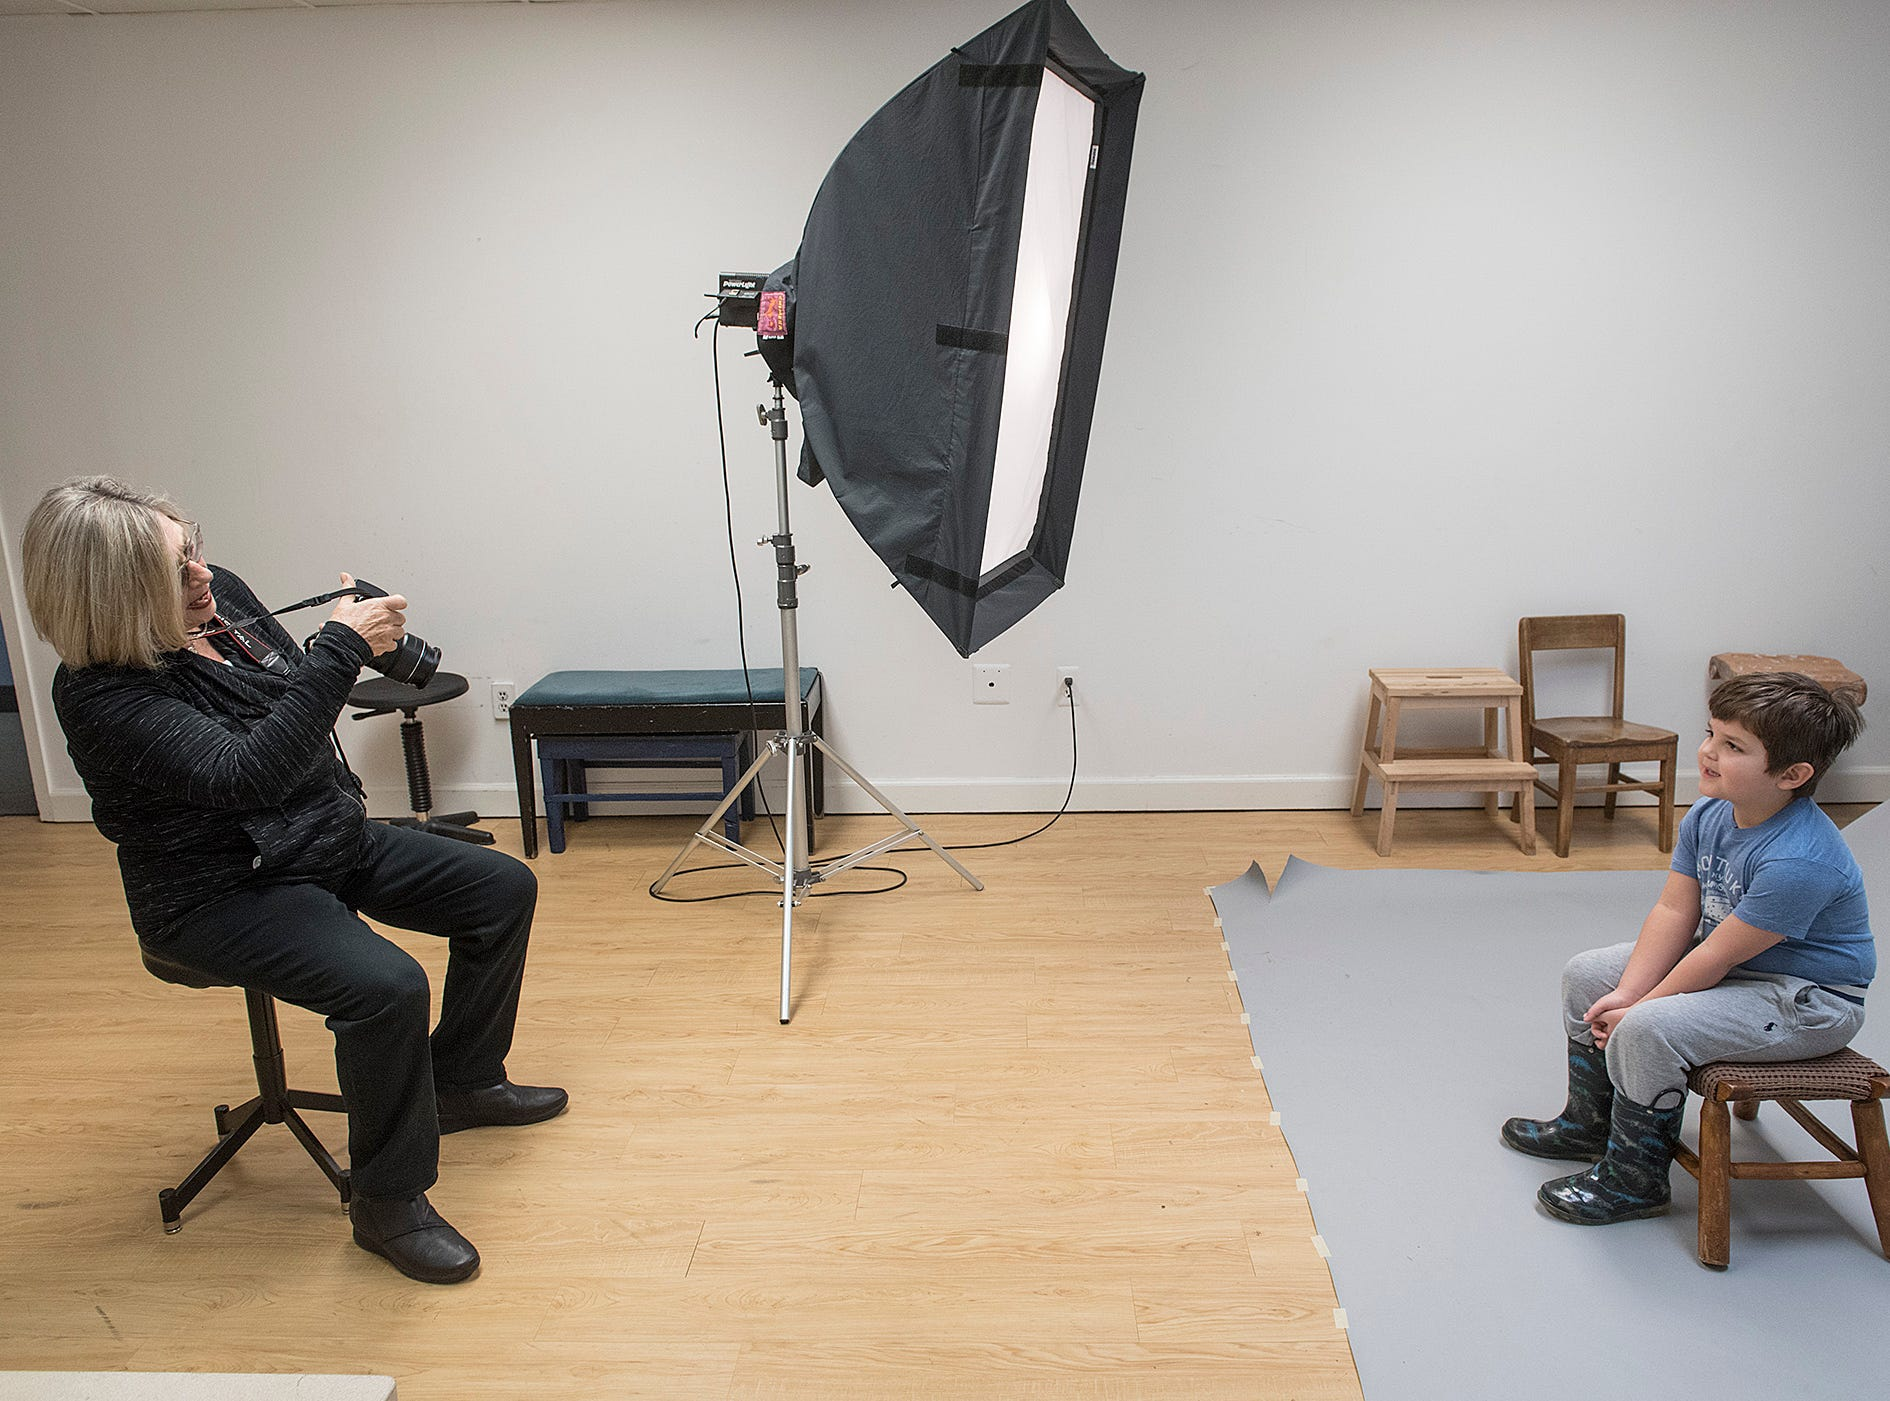 Elaine Yaker checks her last shot of five year old David Rea.